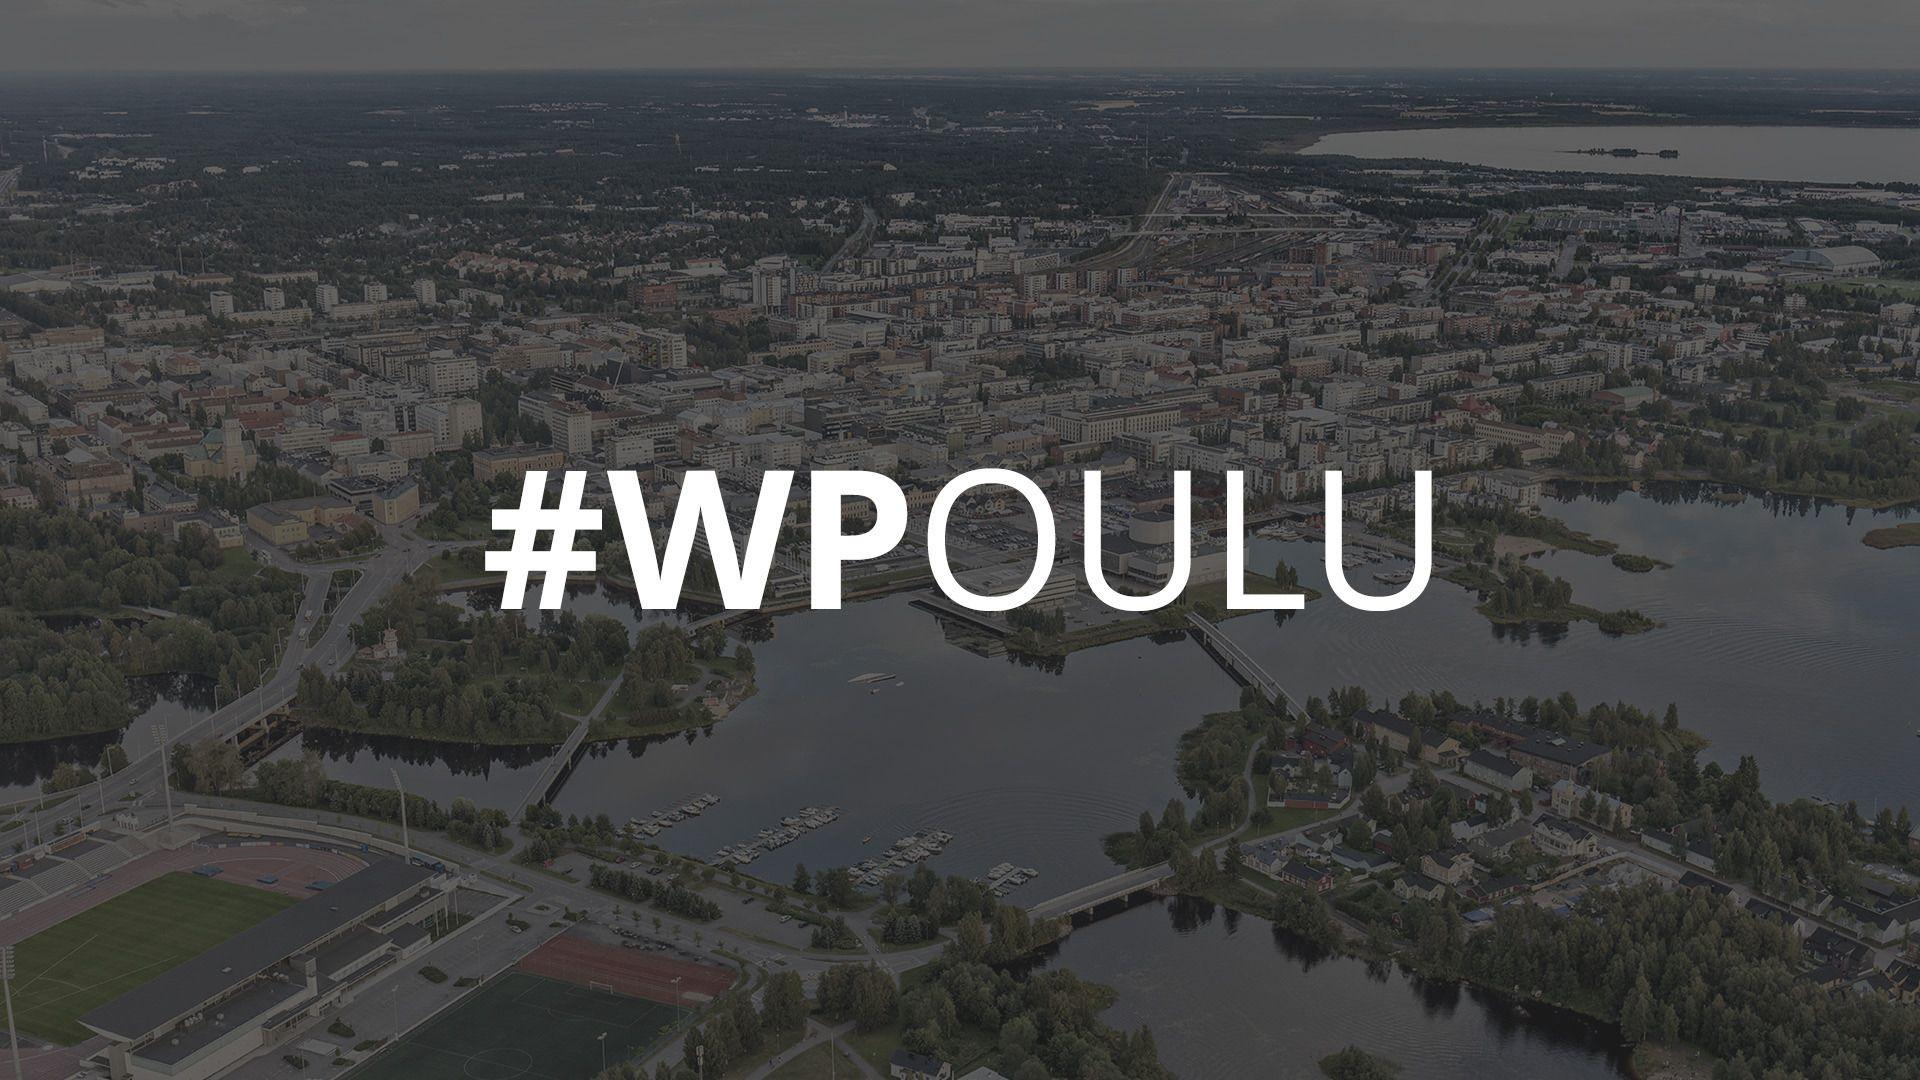 Oulu WordPress Meetup